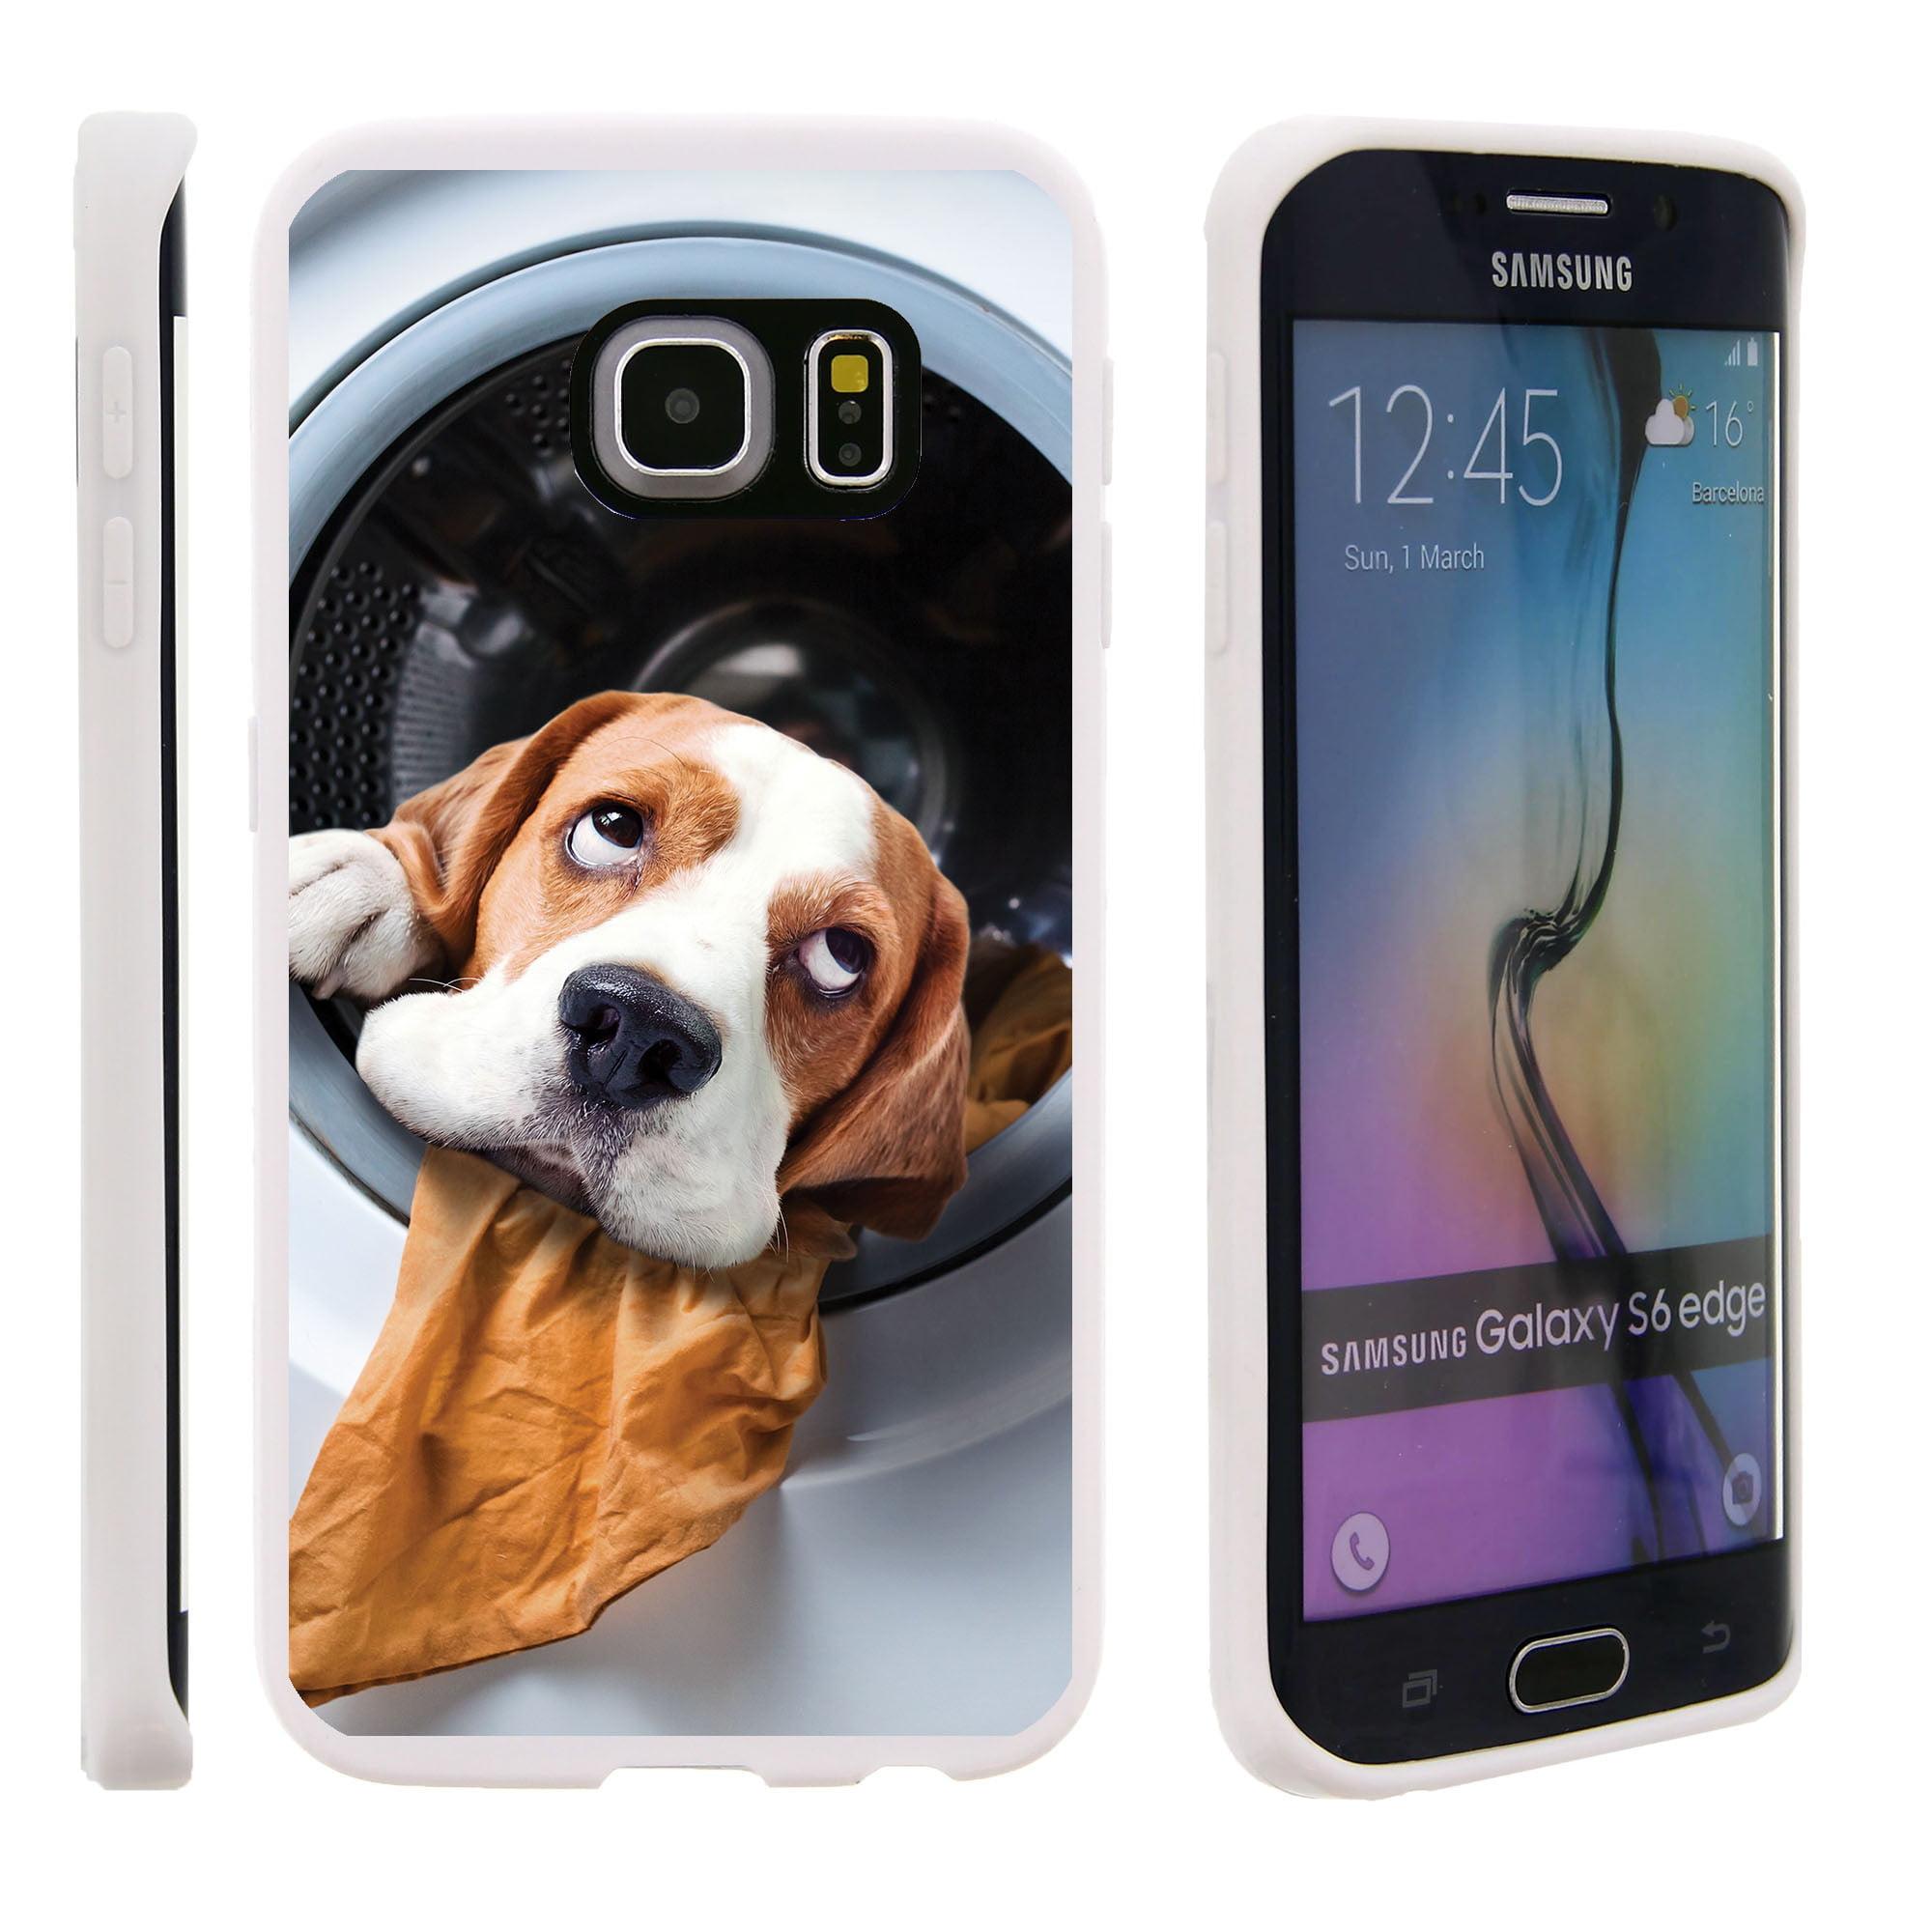 Samsung Galaxy S6 Edge G925, Flexible Case [FLEX FORCE] Slim Durable TPU Sleek Bumper with Unique Designs - Dog in Dryer